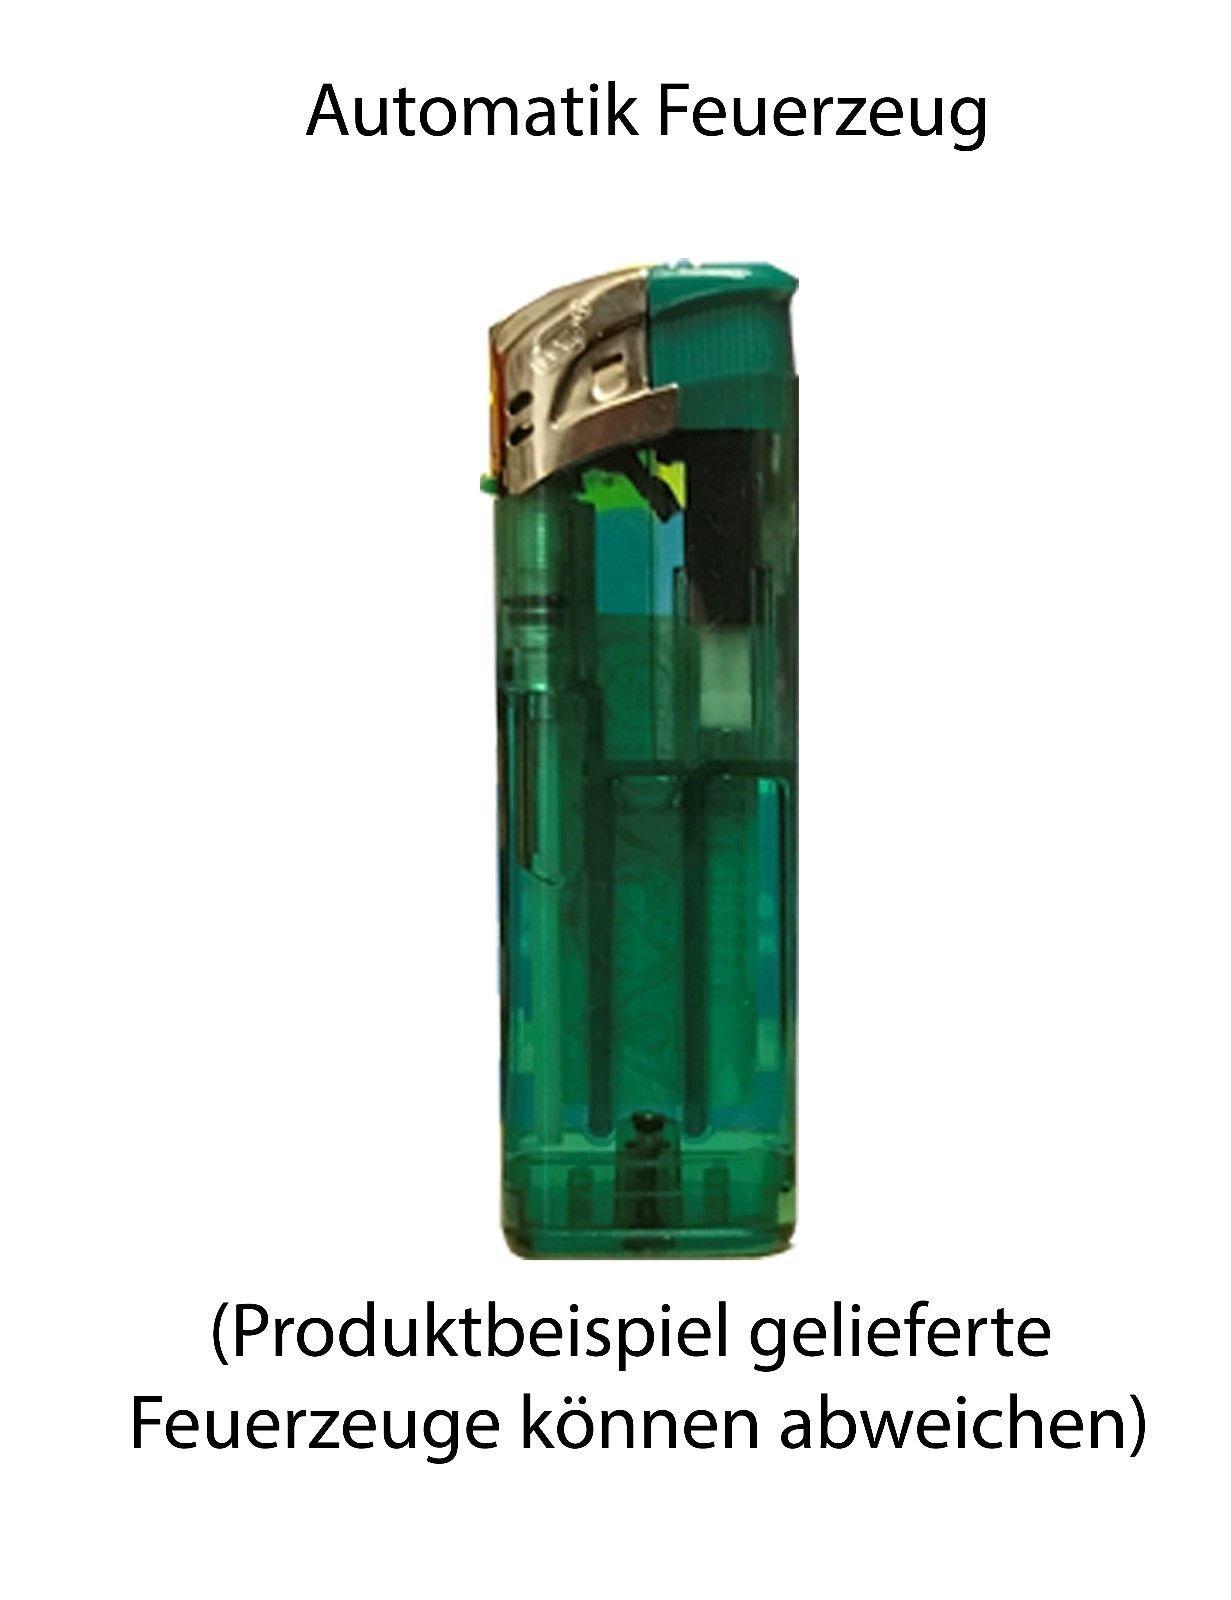 1 x Denim Mega Box Volumentabak 290g Eimer + 1000 Mark1 Hülsen + Feuerzeug